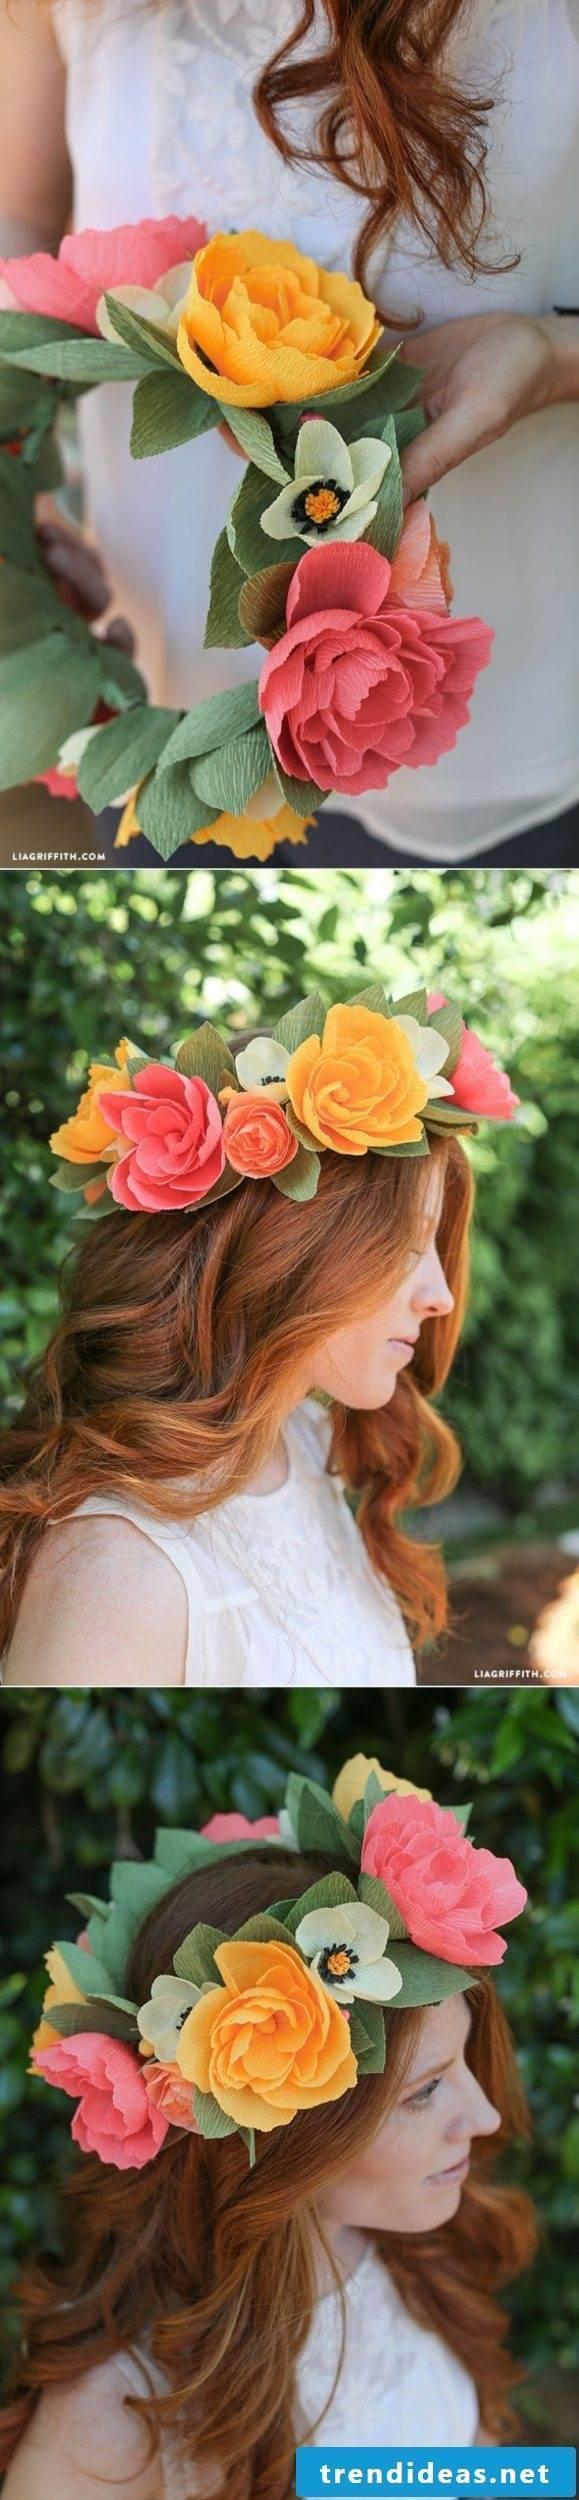 Wreath braid